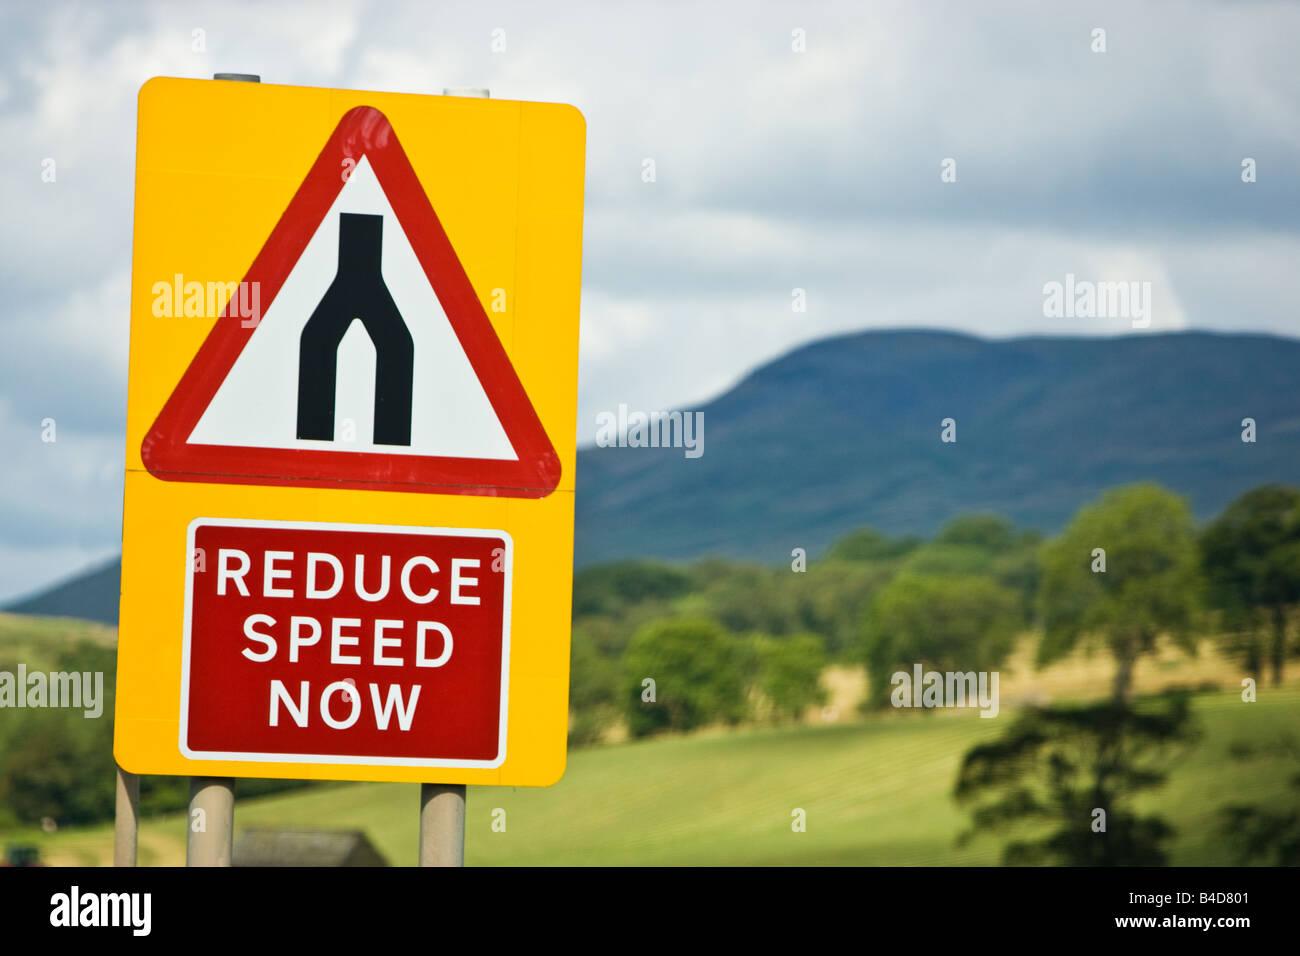 Road sign warning sign of dual carriageway ending speed reduction, roads merge advised, England UK - Stock Image